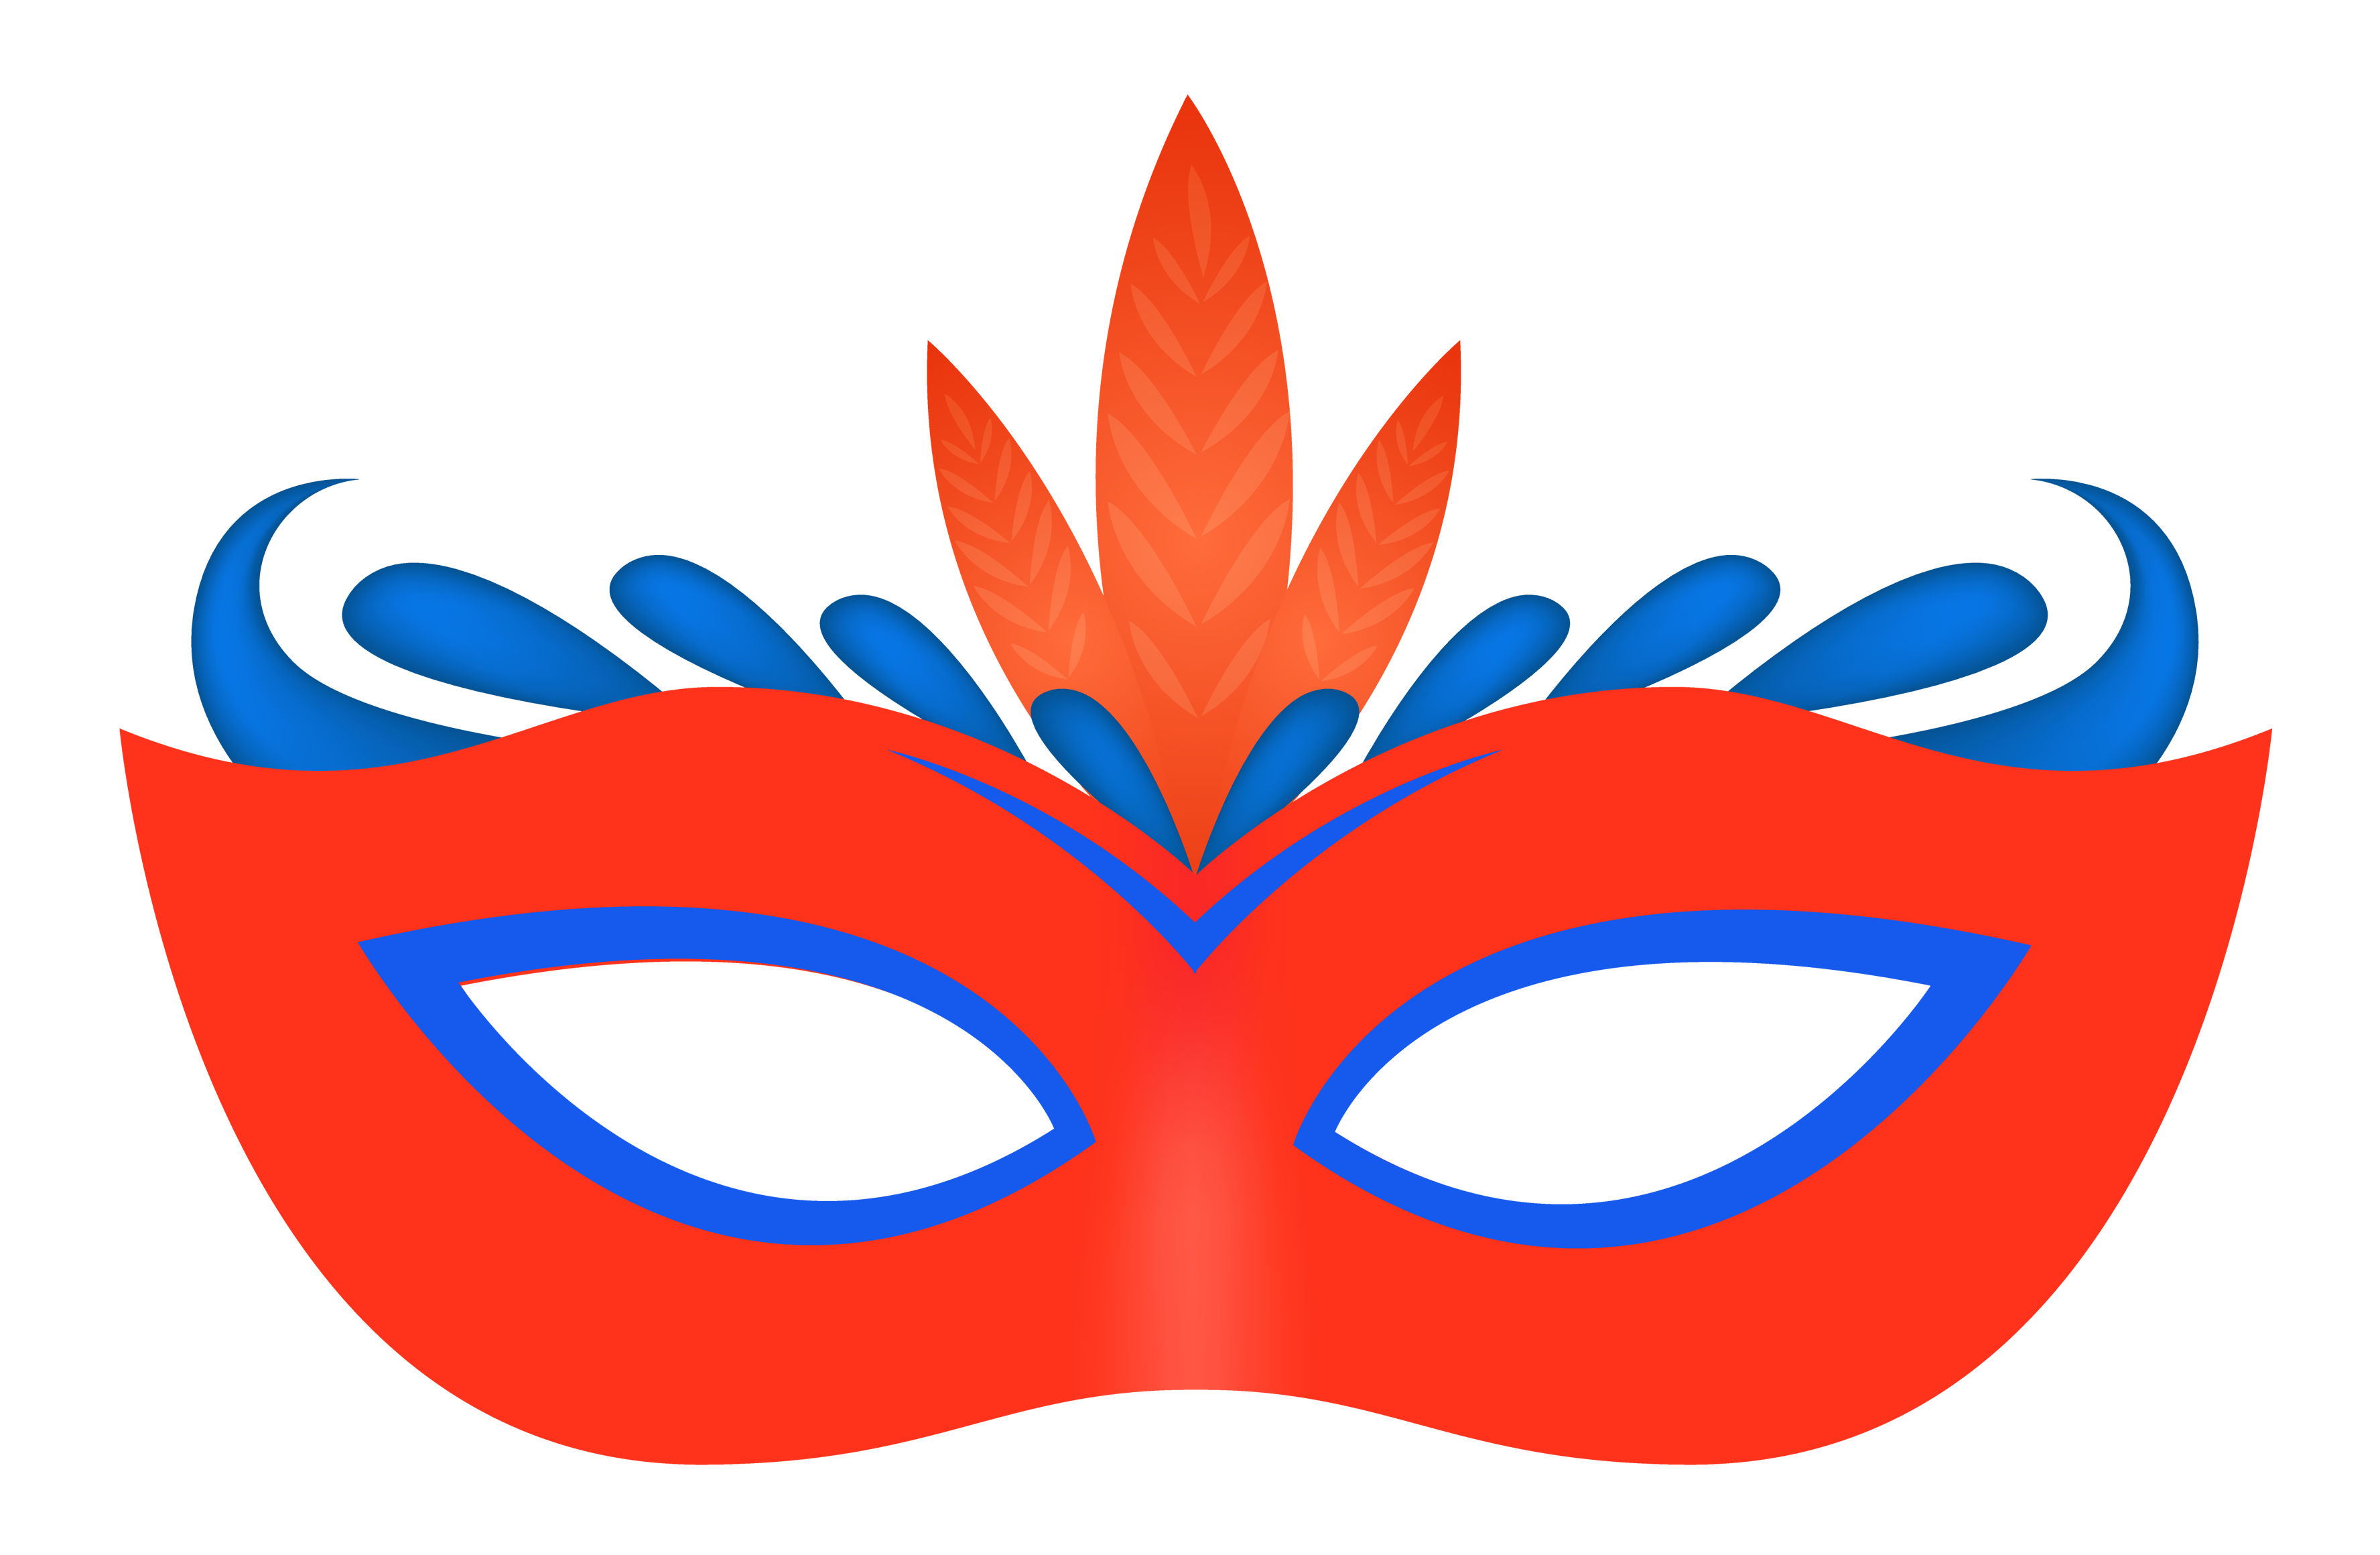 3552x2320 Carnival Eye Mask Png Image